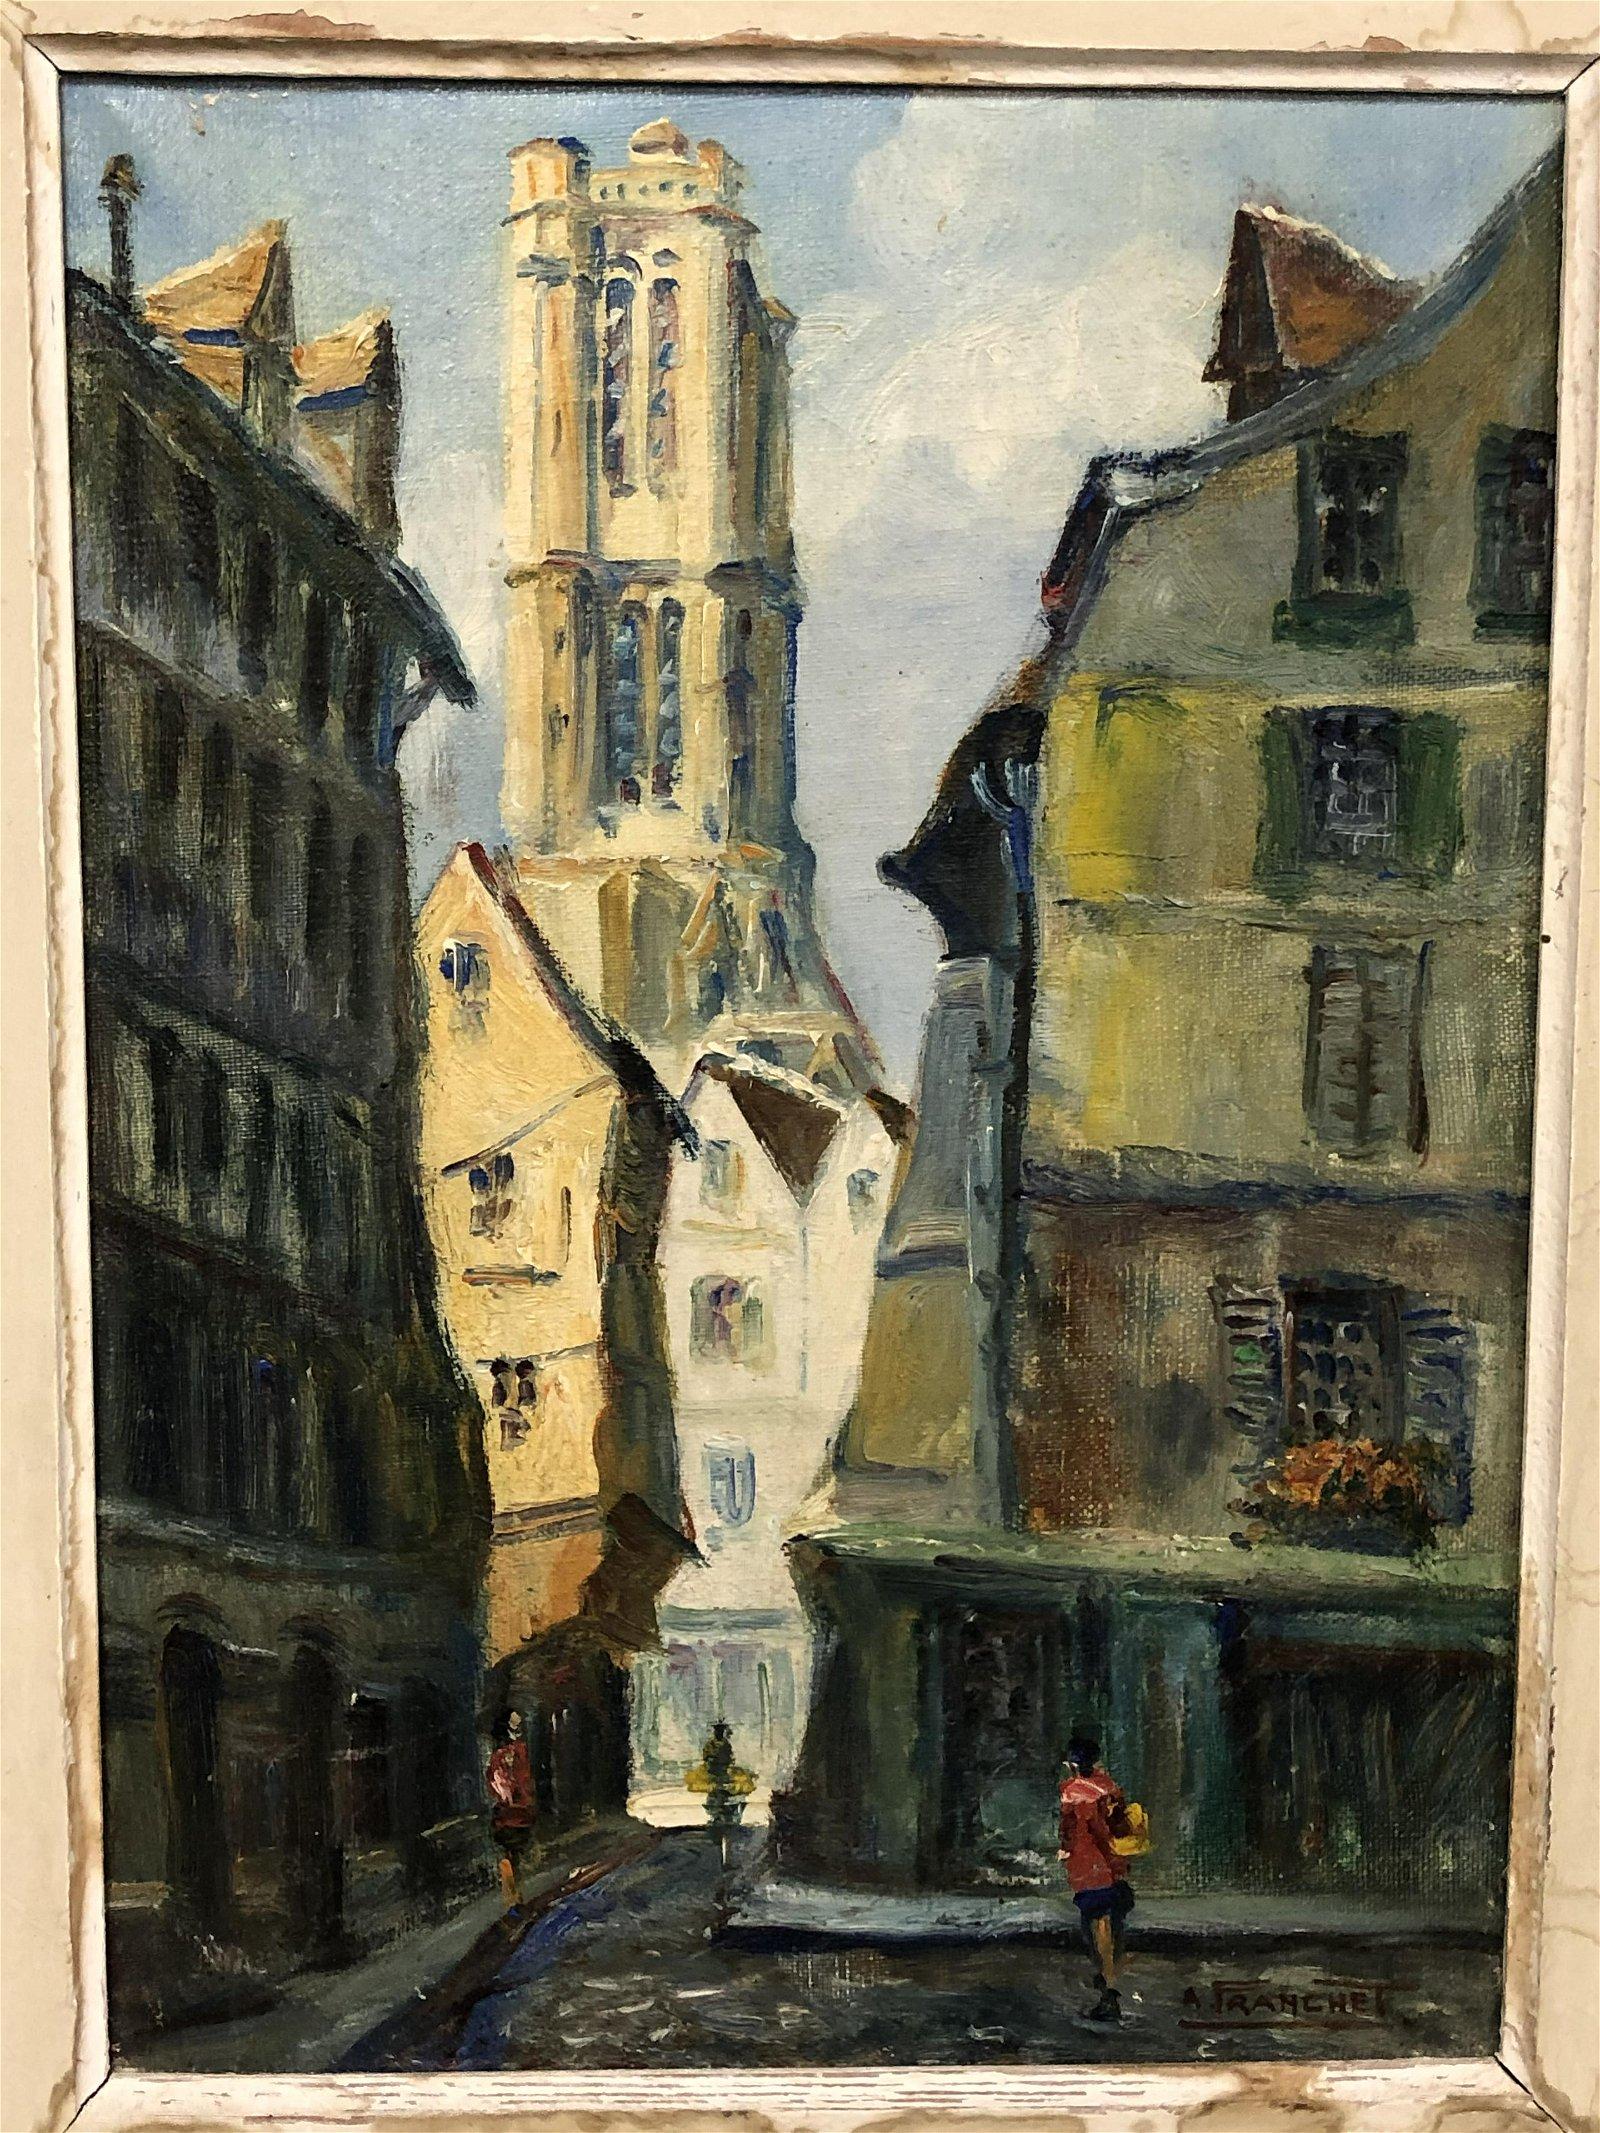 Andre Franchet', Oil on Canvas of Paris